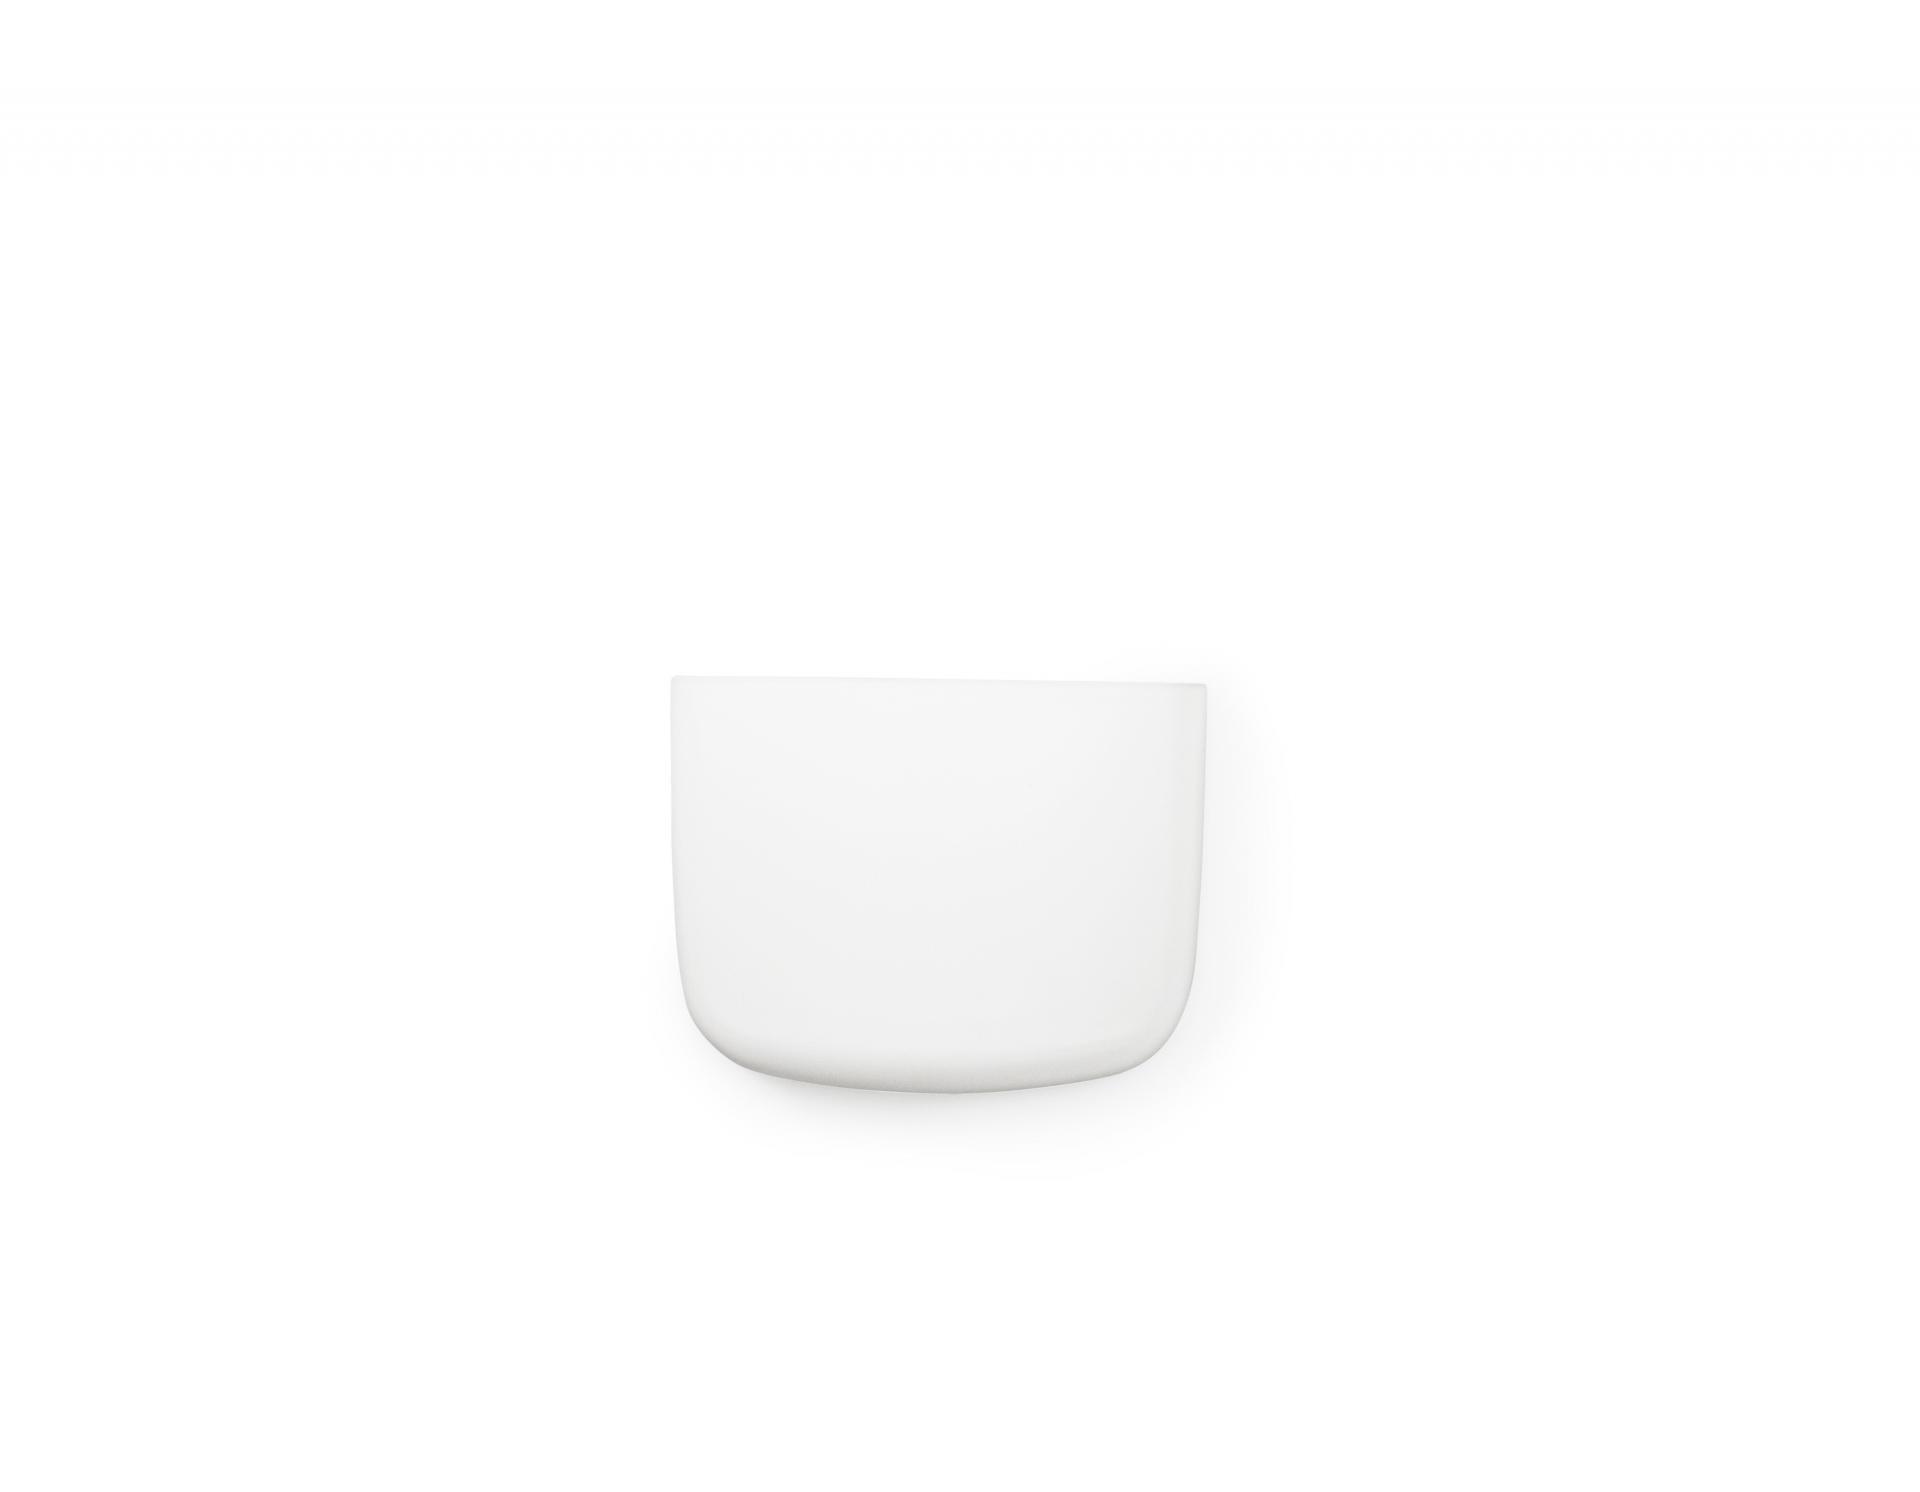 normann COPENHAGEN Nástěnný organizér White Pocket 2, bílá barva, plast